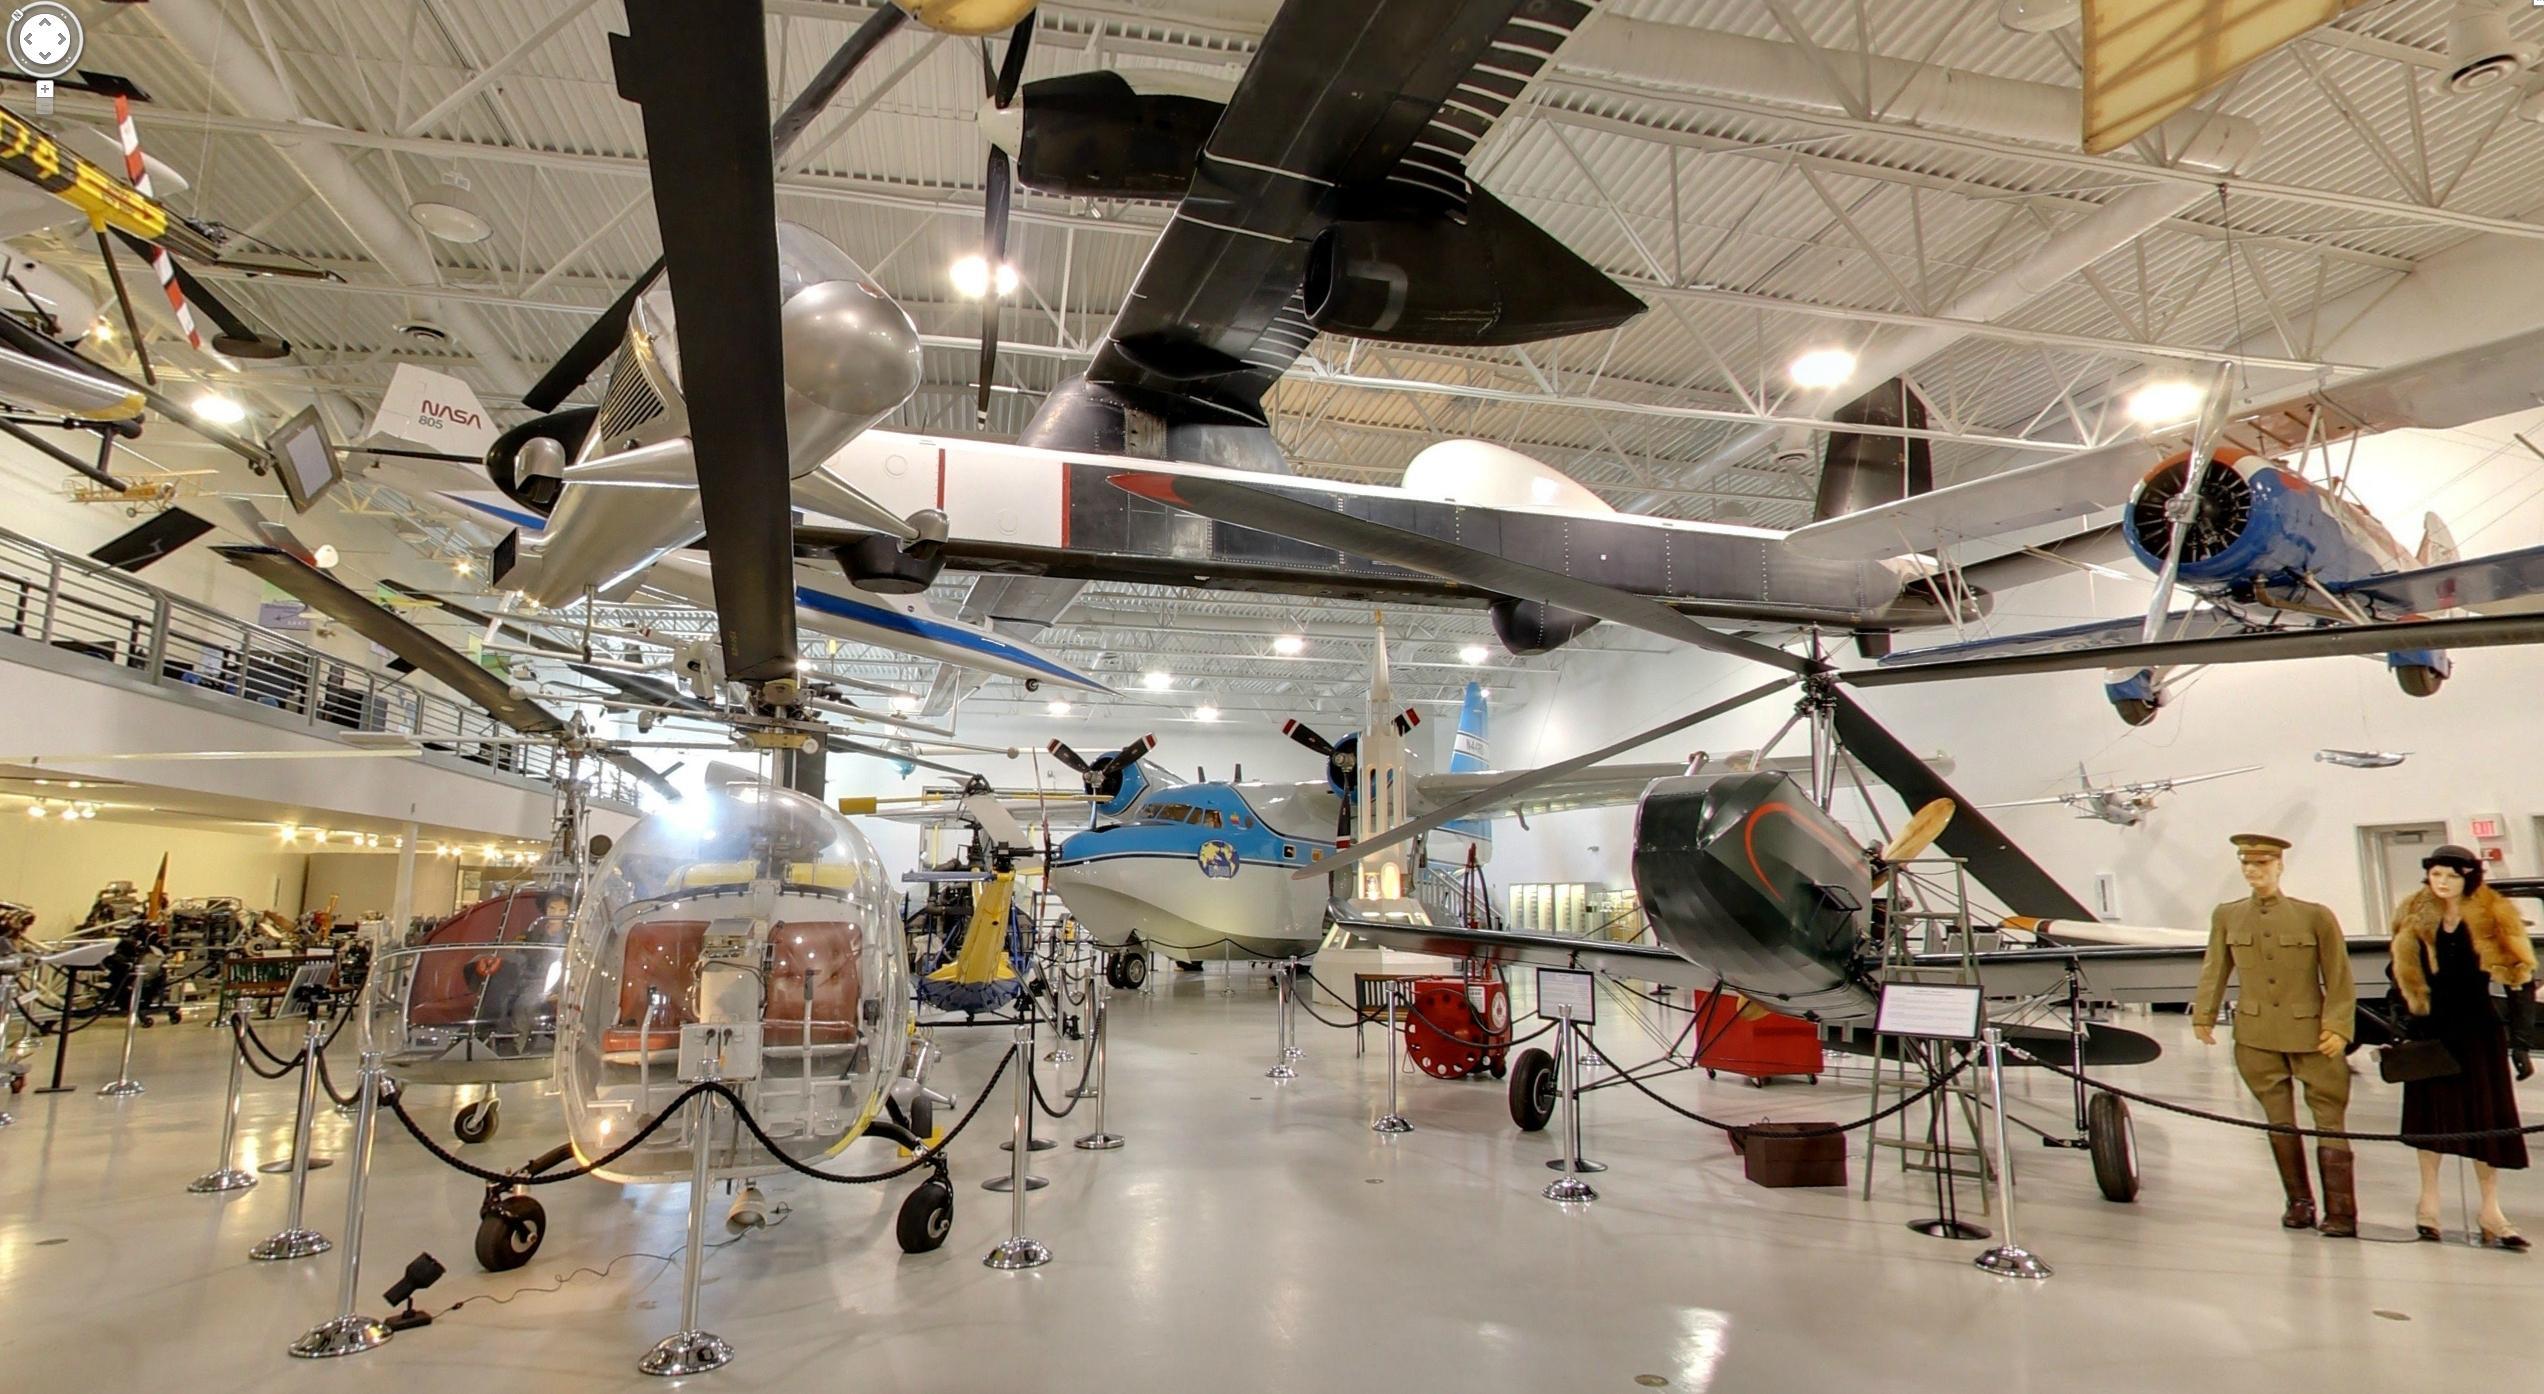 Hiller Aviation Museum Admission